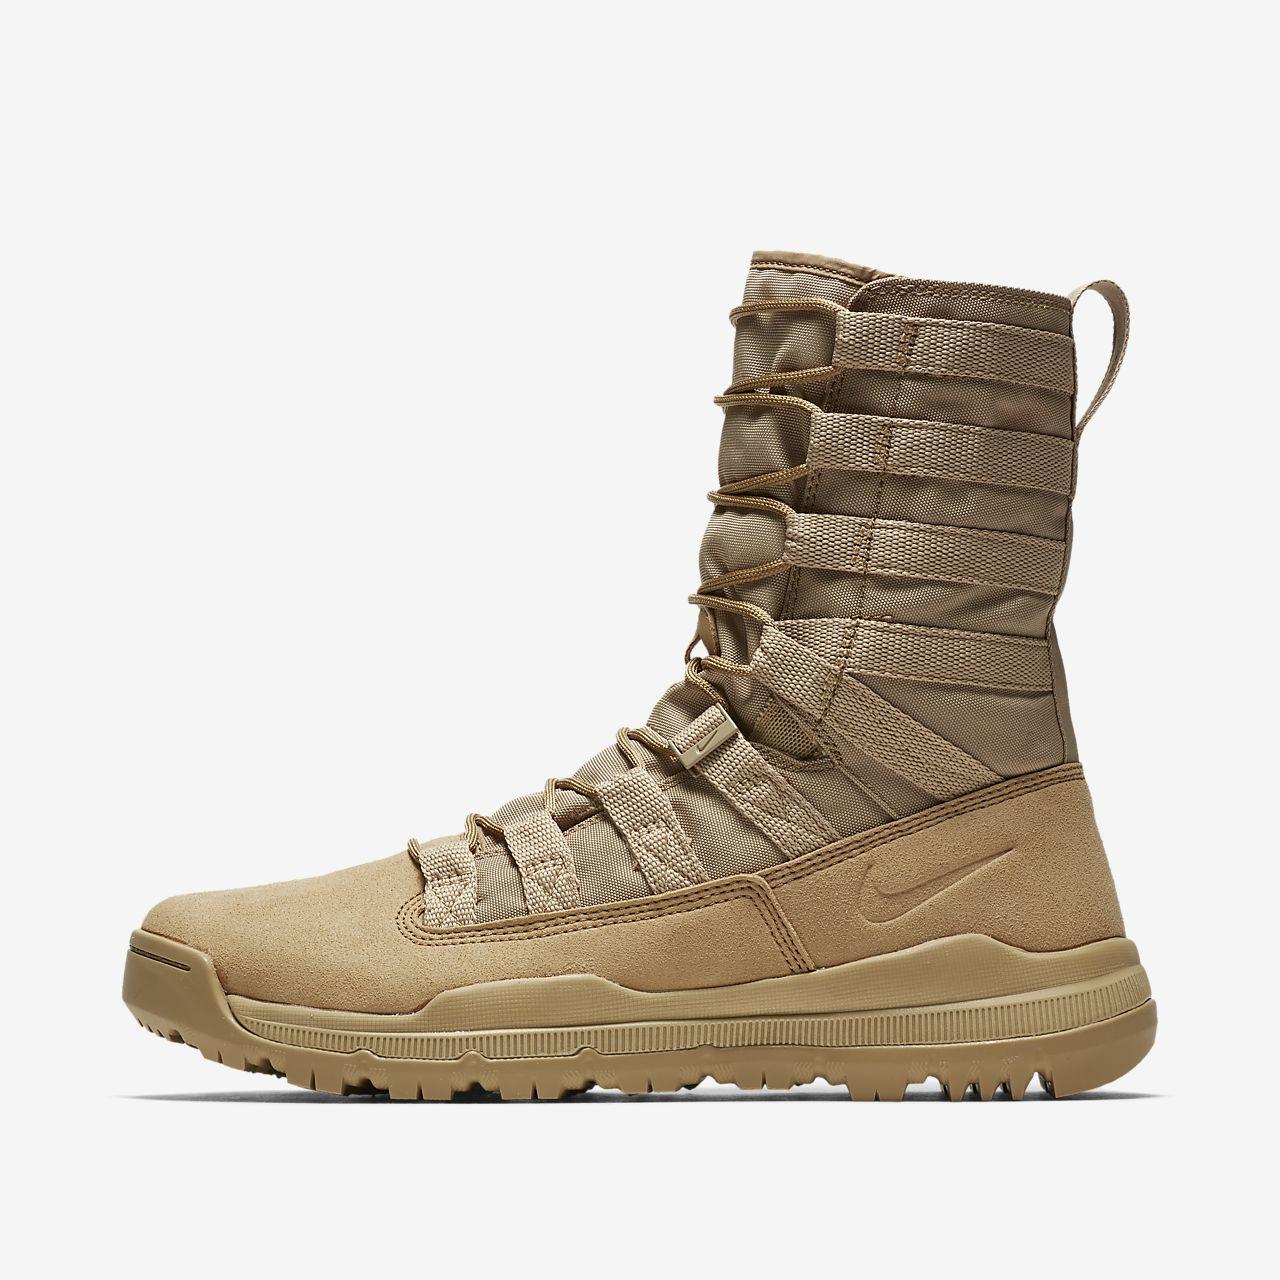 ... Botte Nike SFB Gen 2 20,5 cm mixte